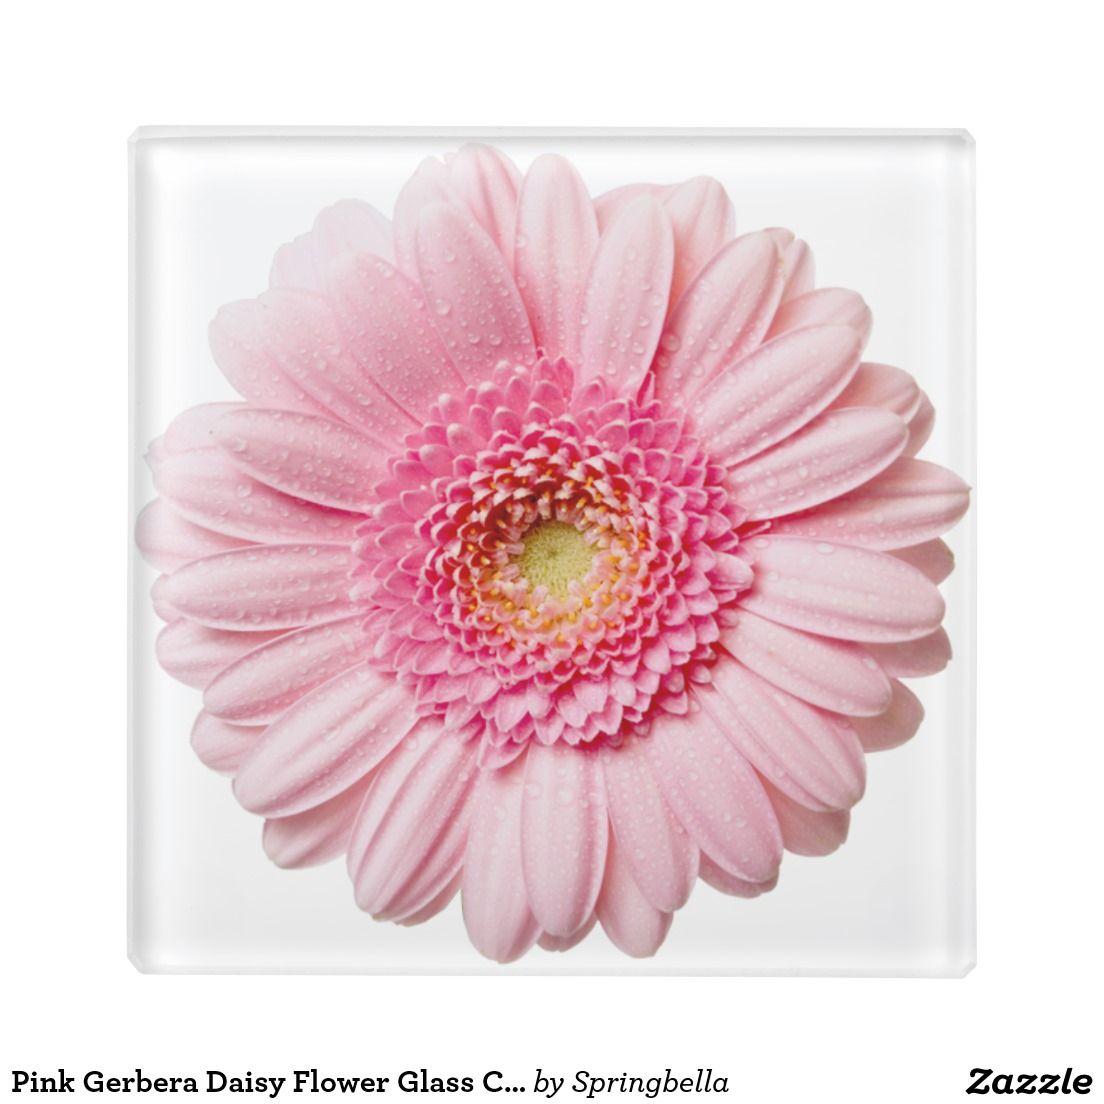 Pink Gerbera Daisy Flower Glass Coaster Zazzle Com Pink Gerbera Gerbera Daisy Gerbera